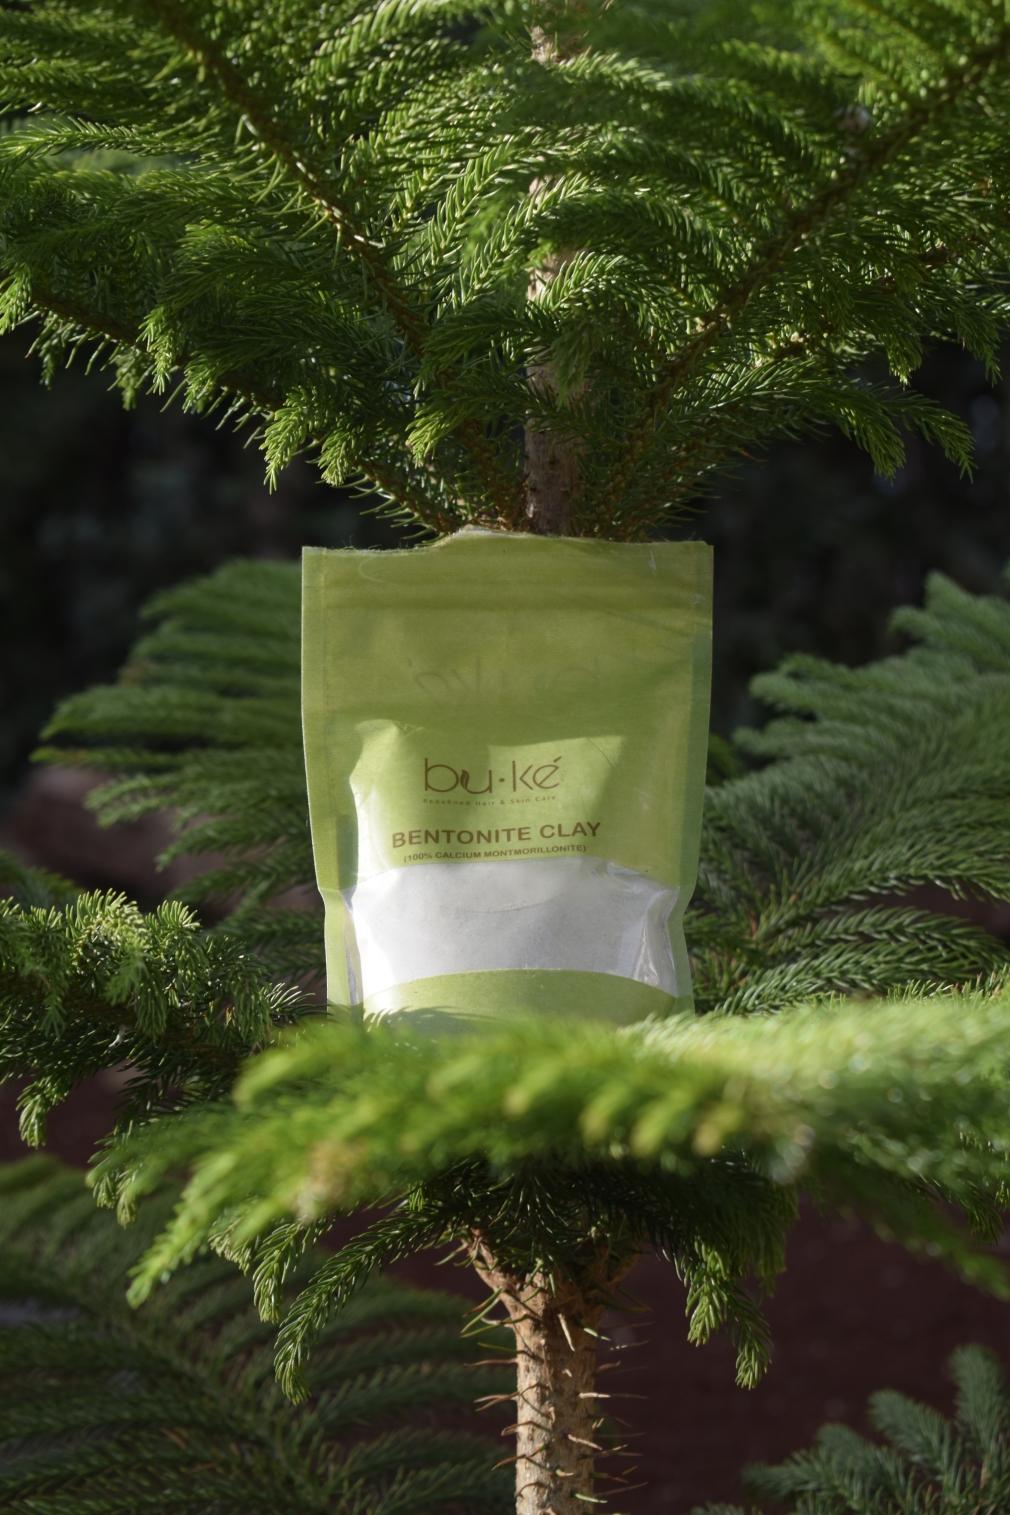 Bentonite clay for use in natural hair mask